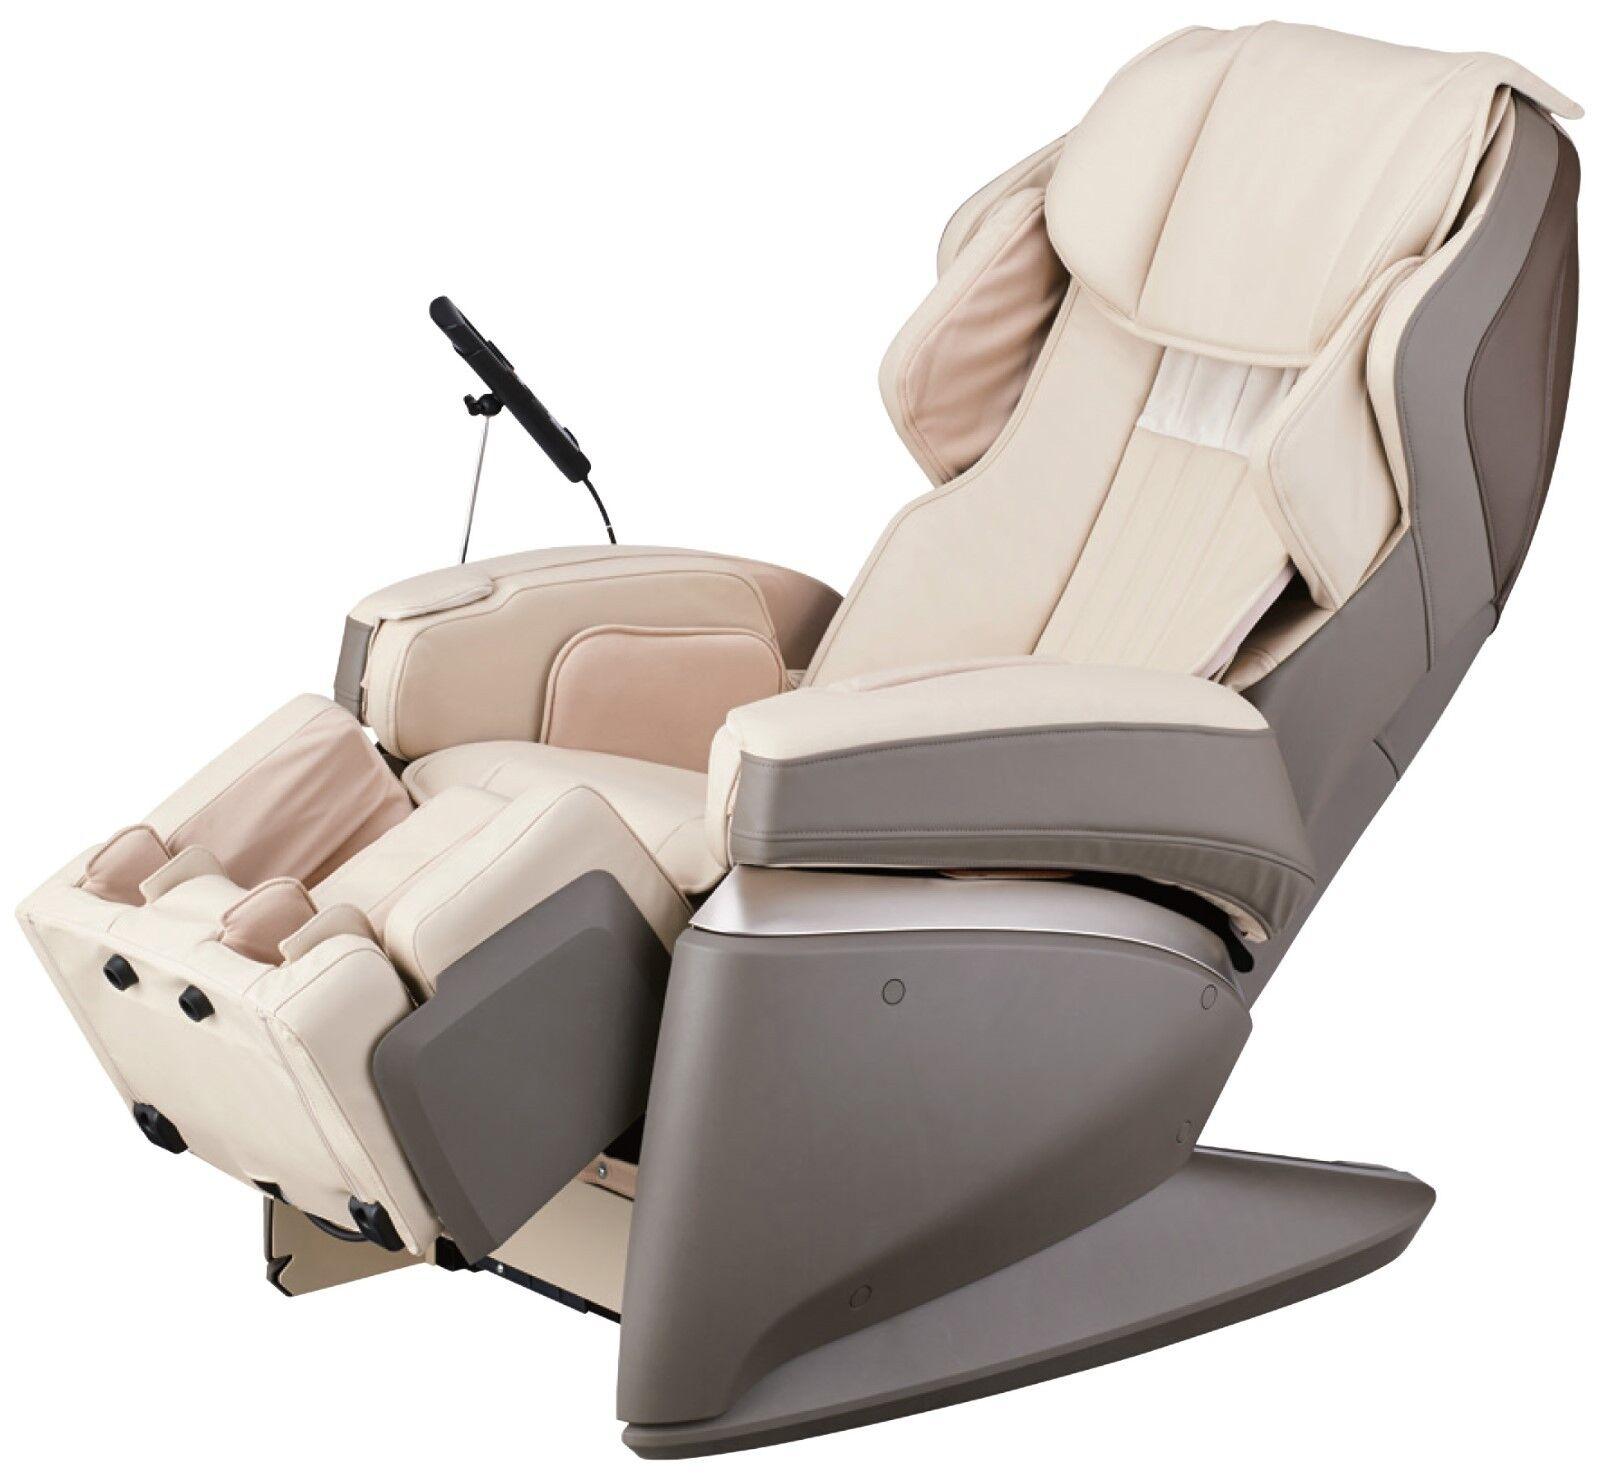 Osaki JP Japan Premium 4s Massage Chair 4d Recliner With Heat